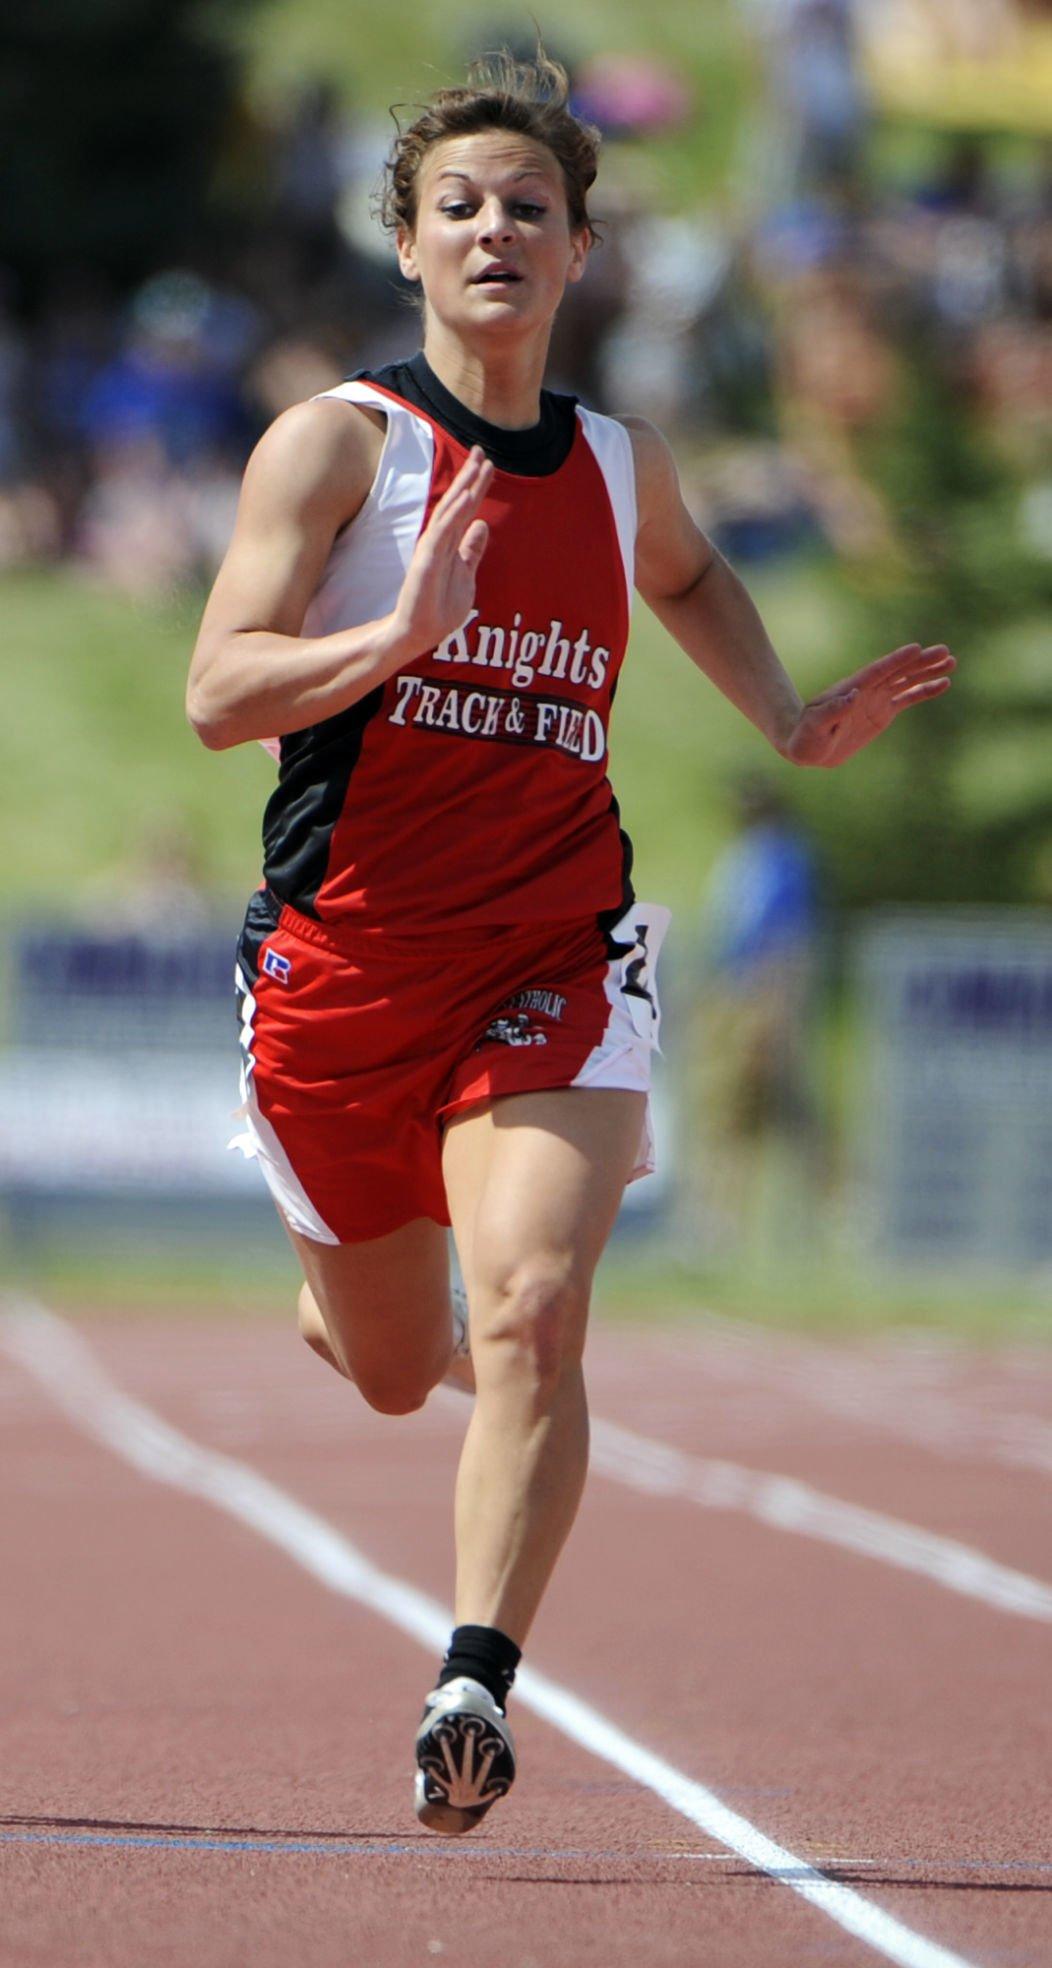 Nicole Brungardt-2008 LJS Female Athlete of the Year